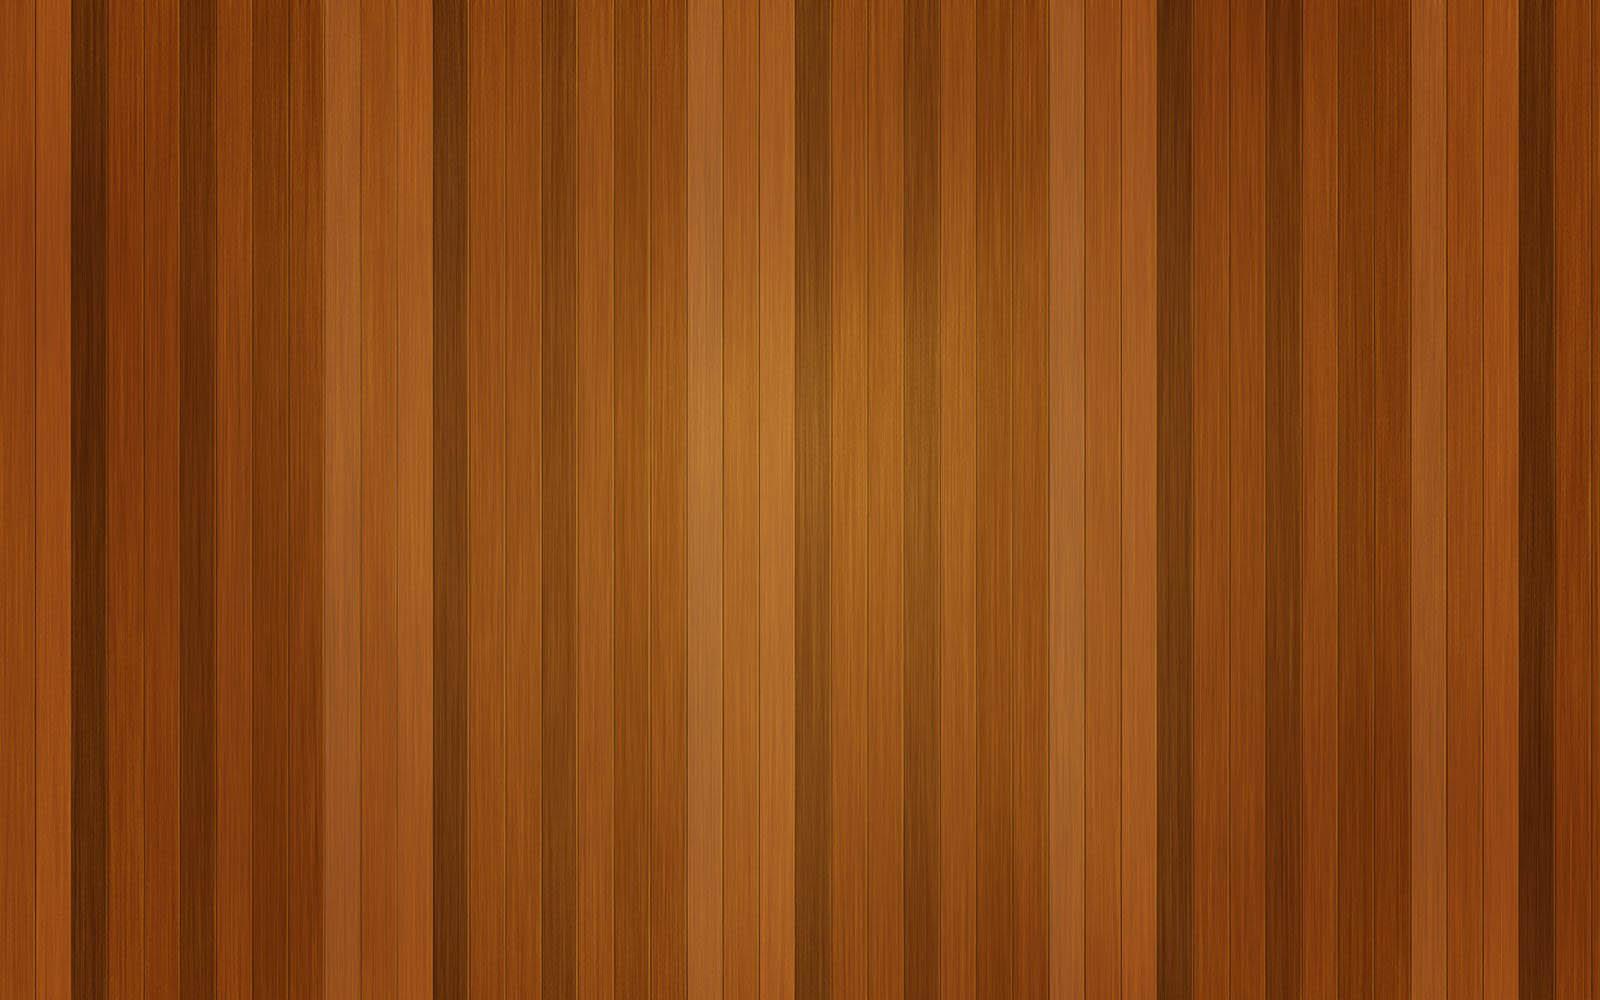 wood wallpaper 2015   Grasscloth Wallpaper 1600x1000